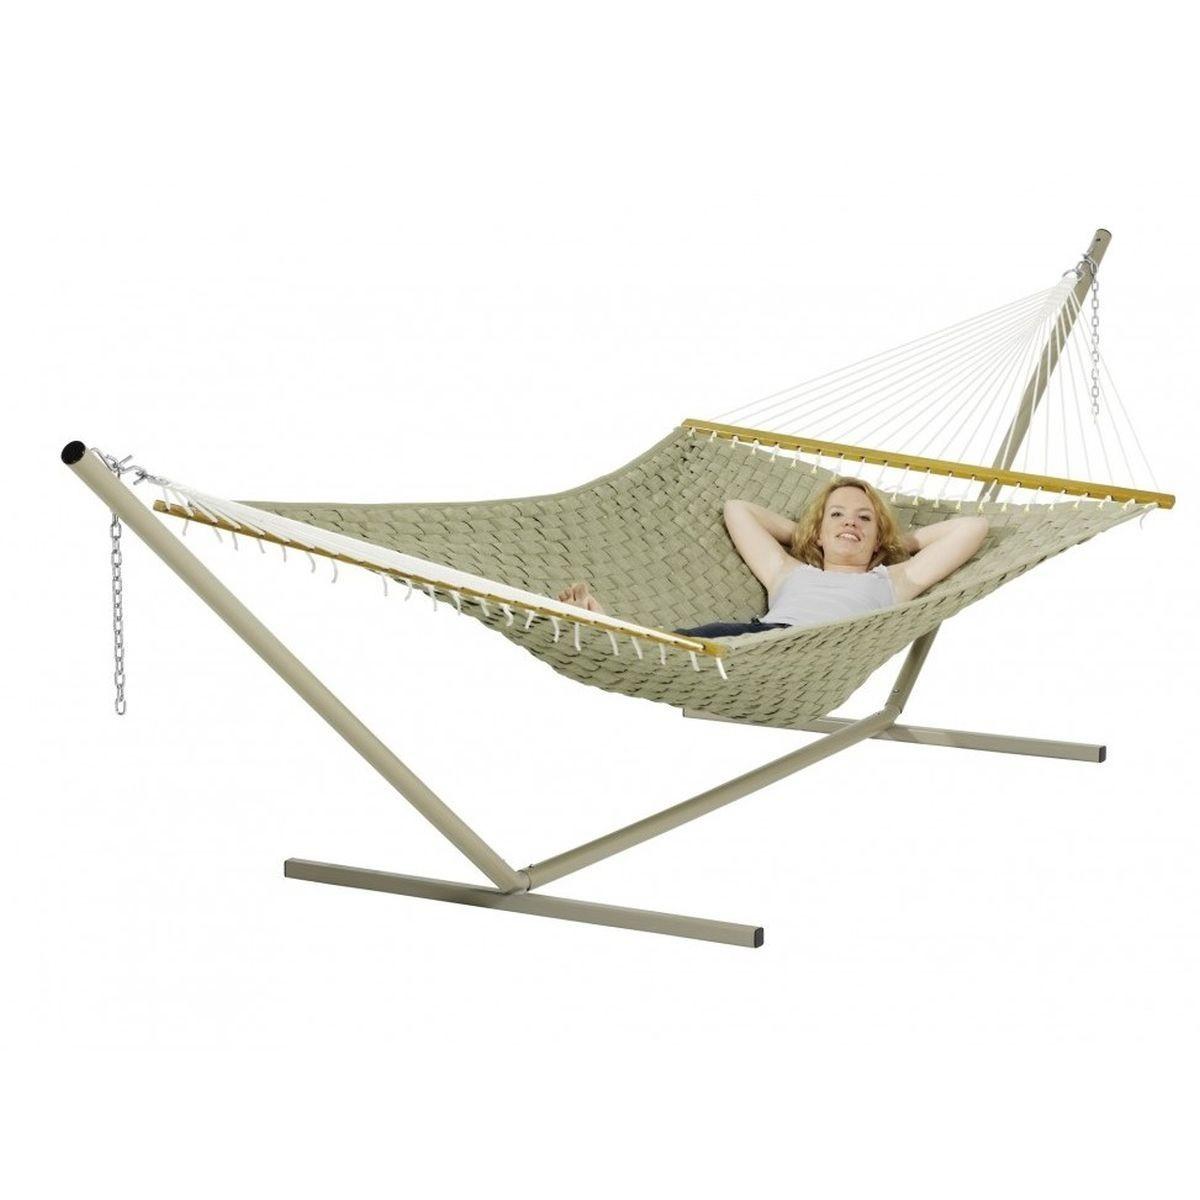 la siesta hamac avec support oceano louisianna crocodile. Black Bedroom Furniture Sets. Home Design Ideas